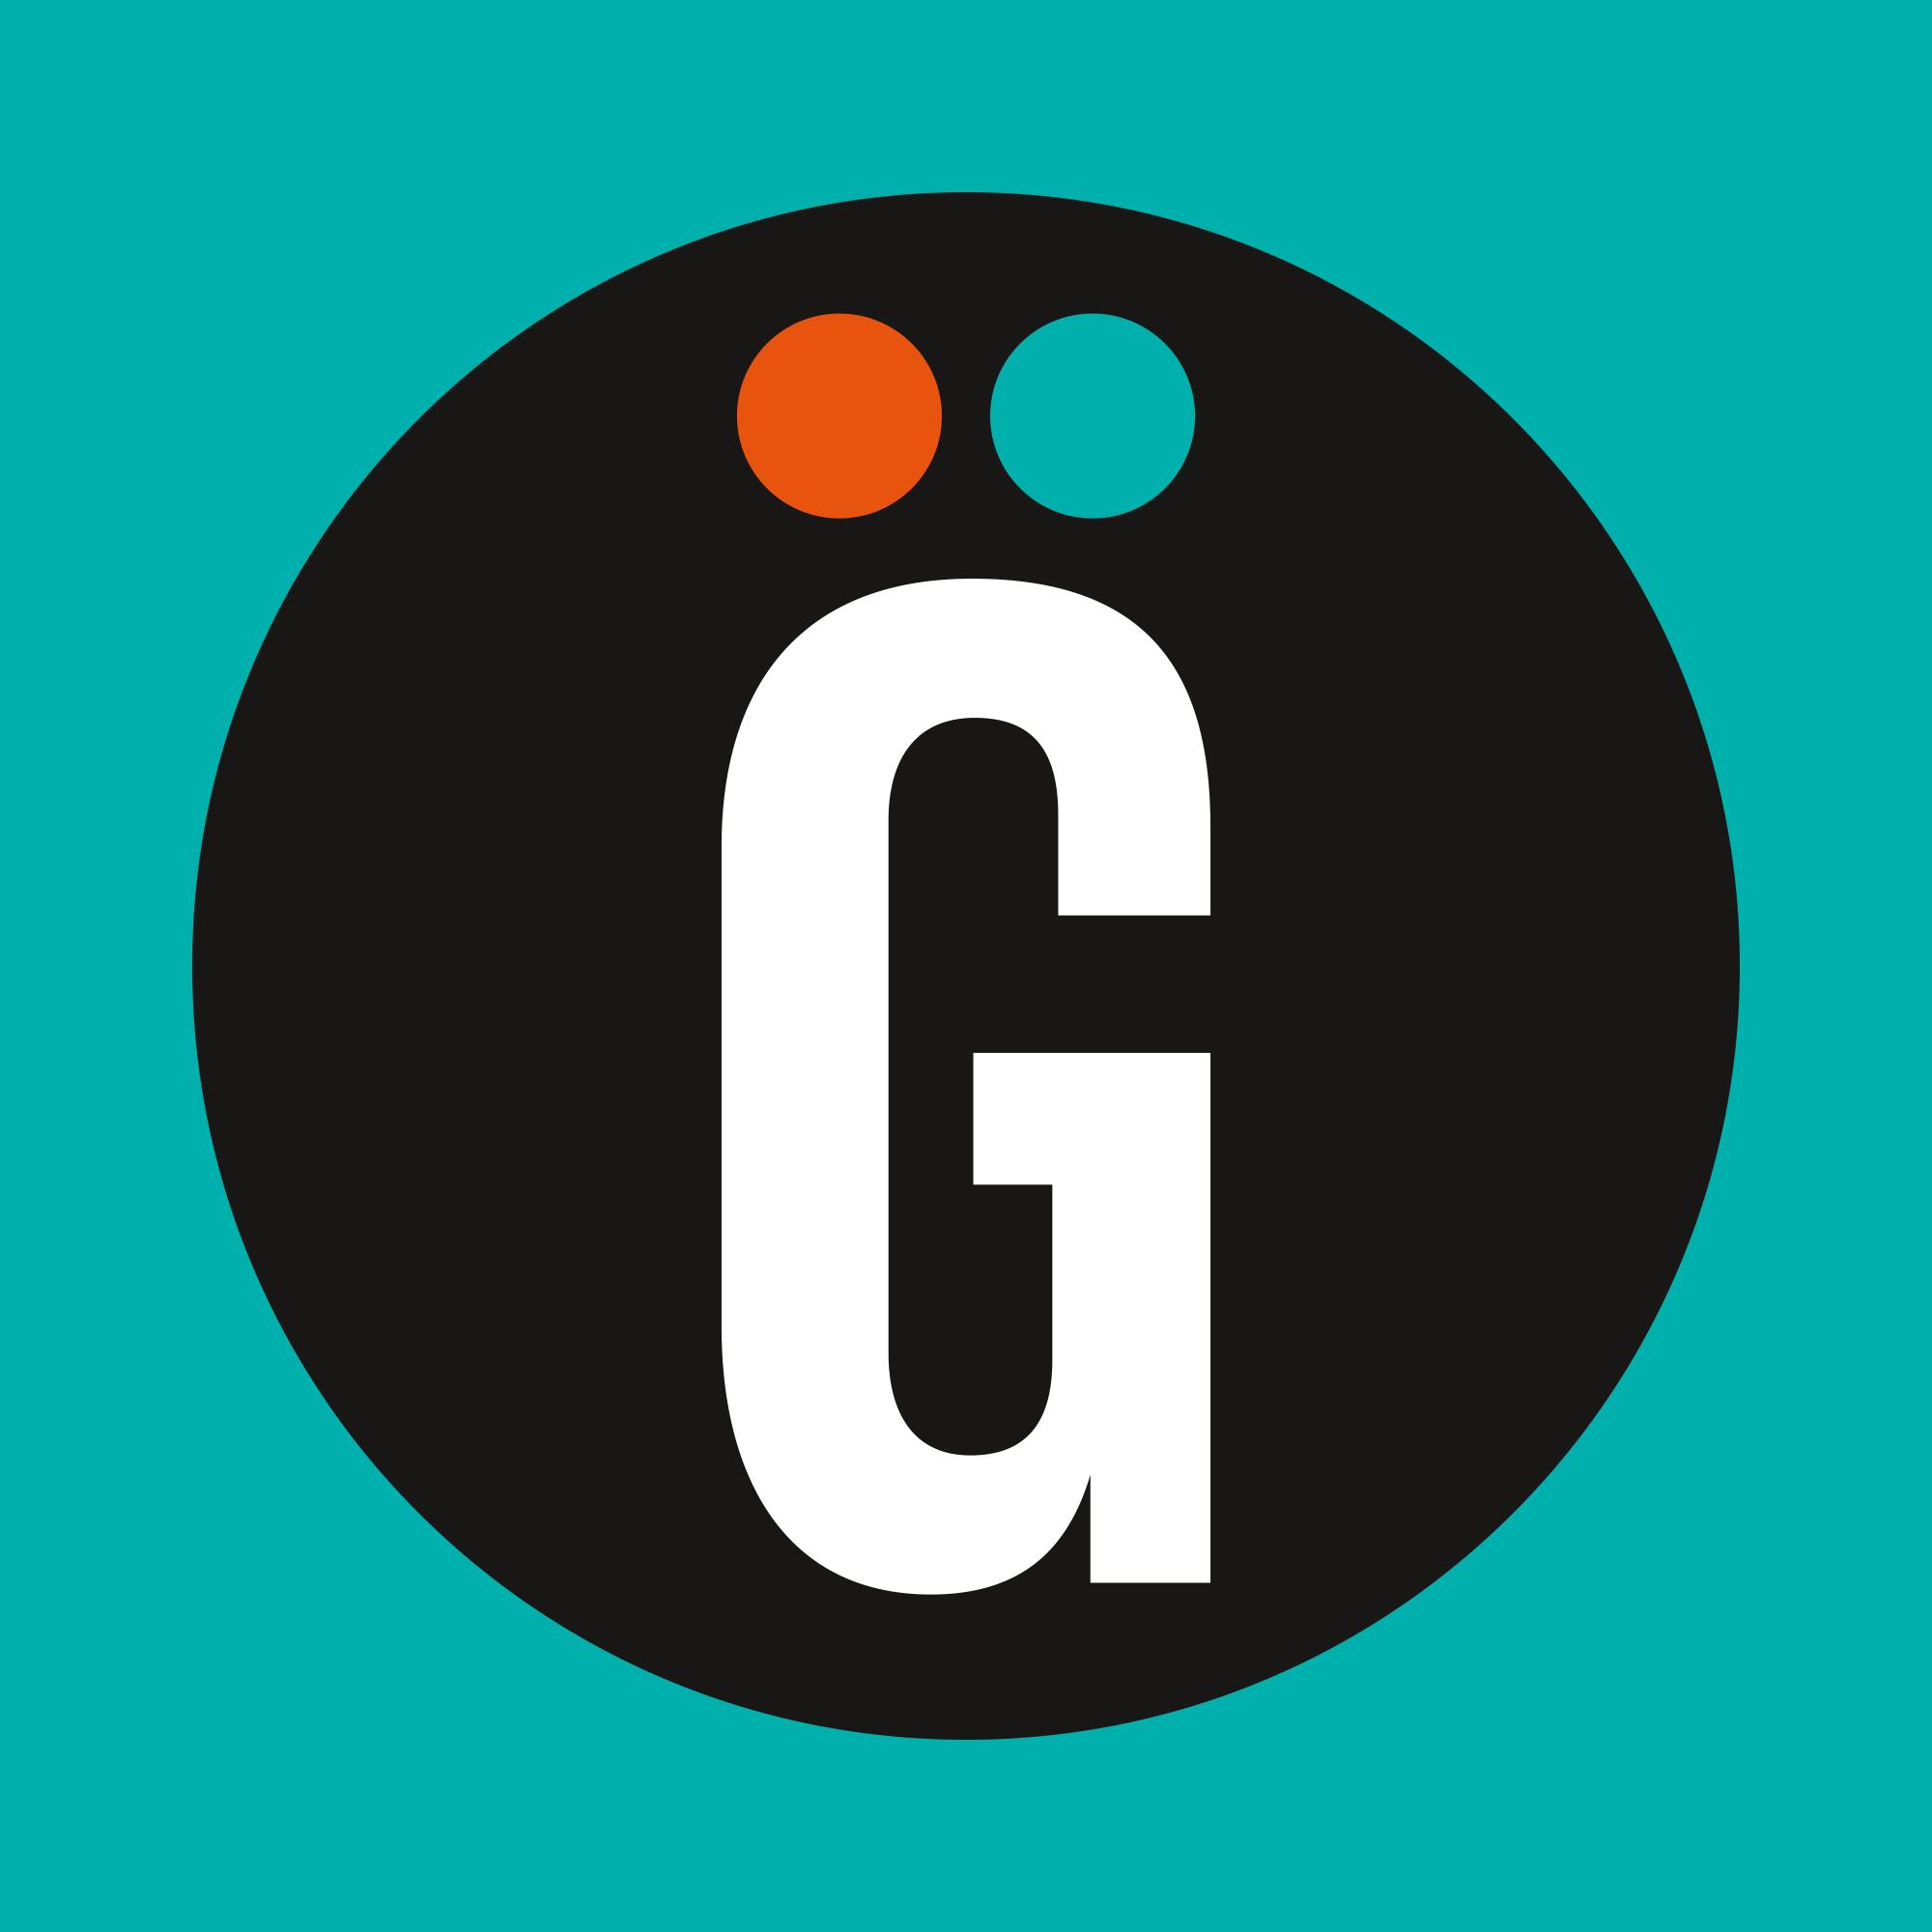 Groove Café & Gallery